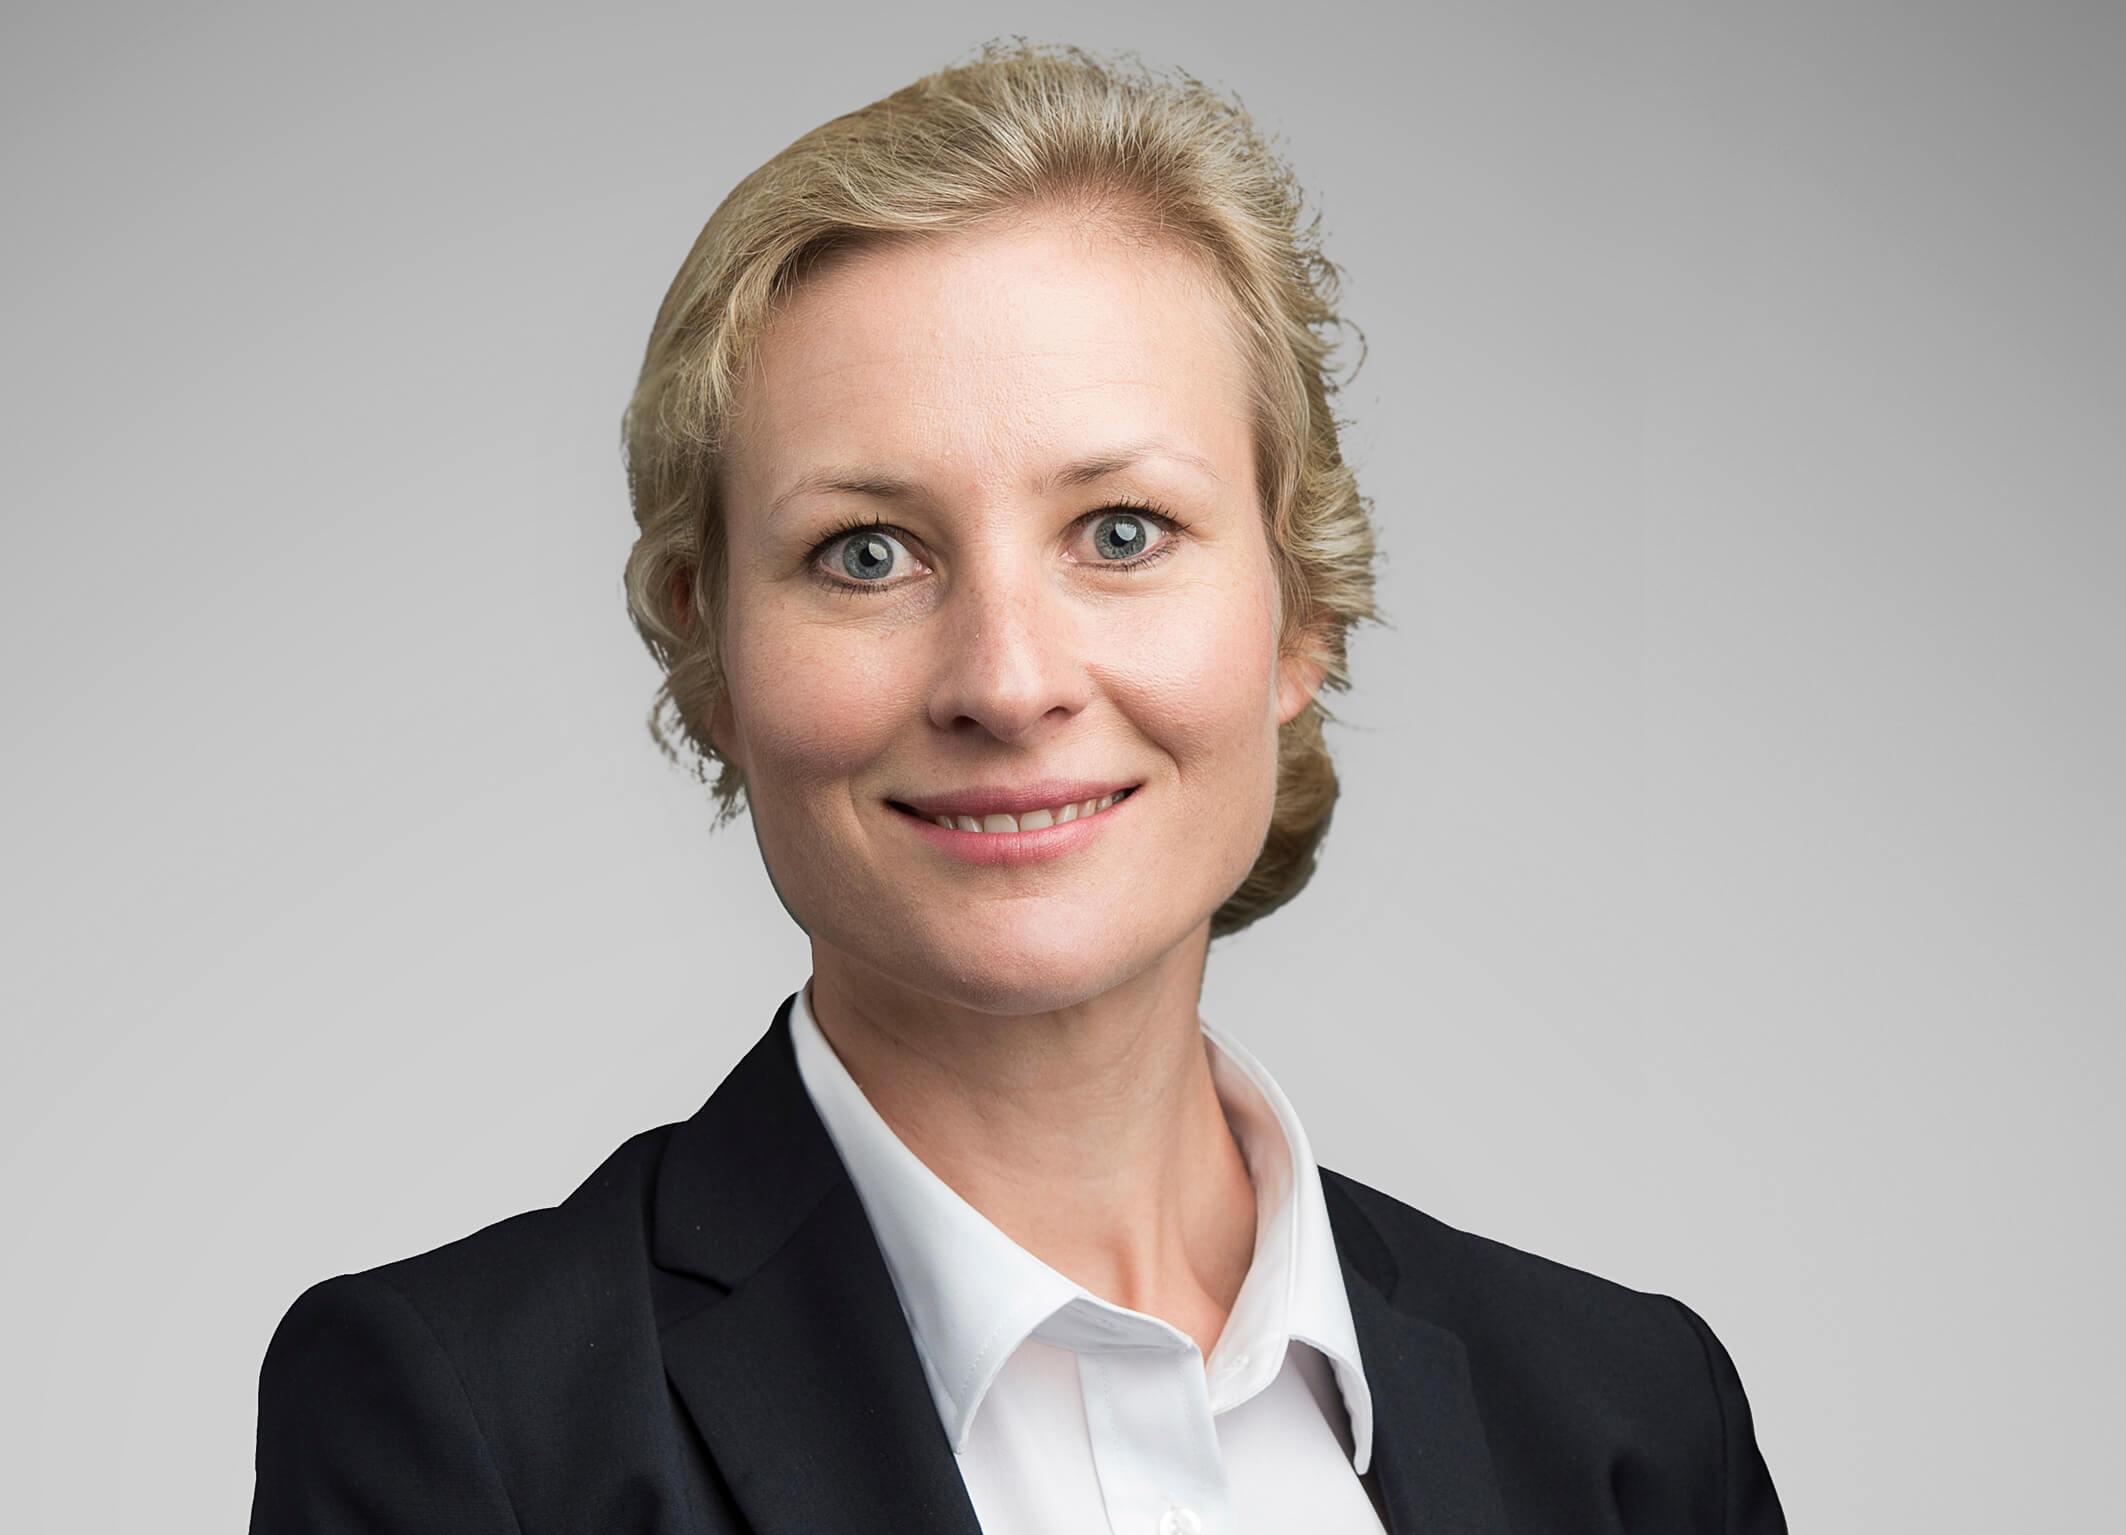 Vi gratulerer Victoria Sæland med advokatbevilling!